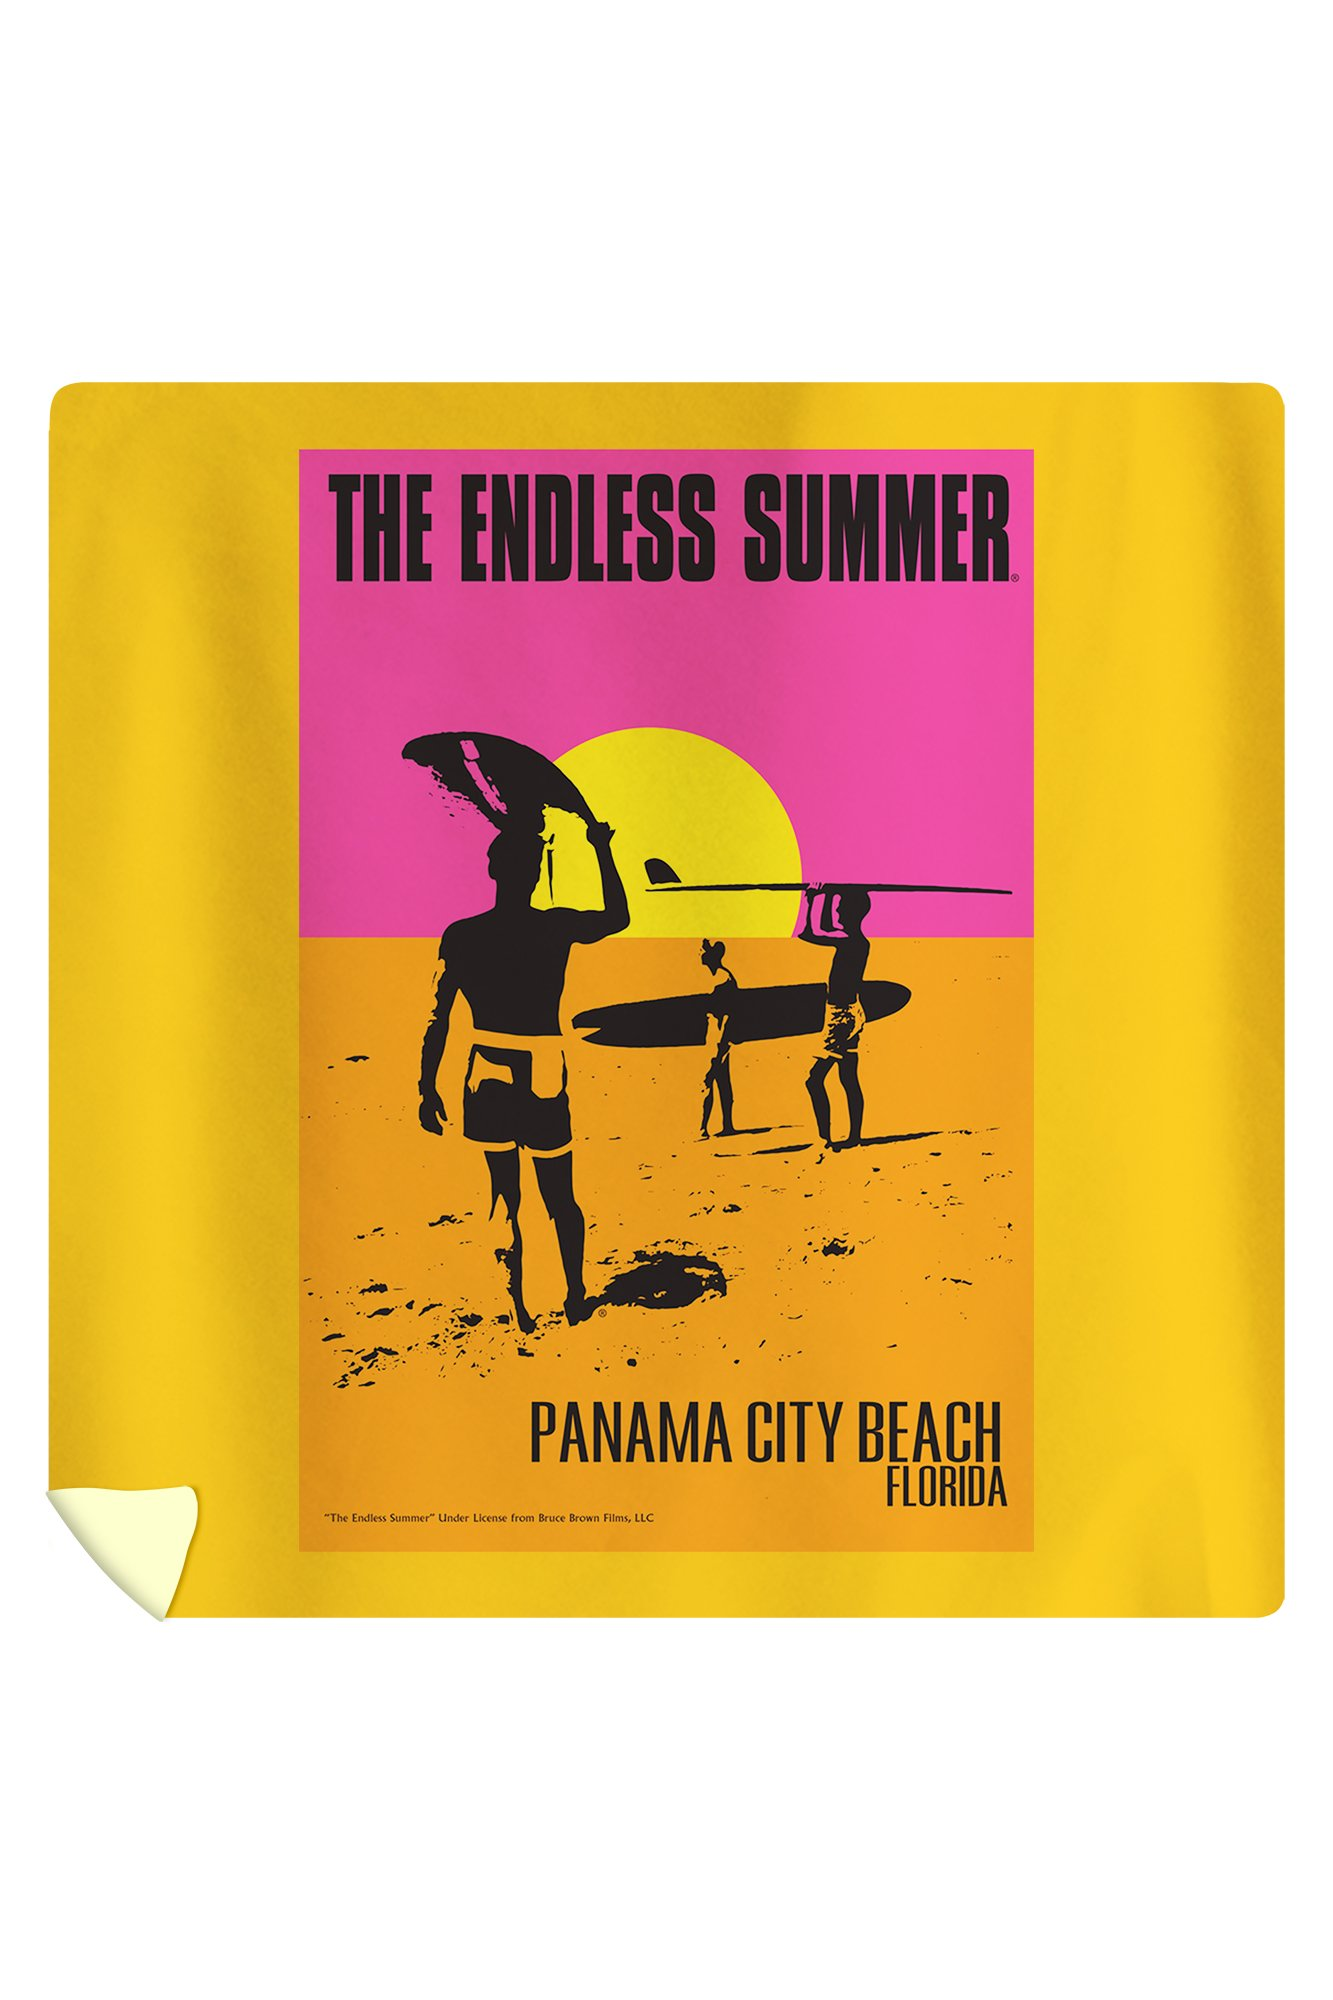 Panama City Beach, Florida - The Endless Summer Movie Poster (88x88 Queen Microfiber Duvet Cover)